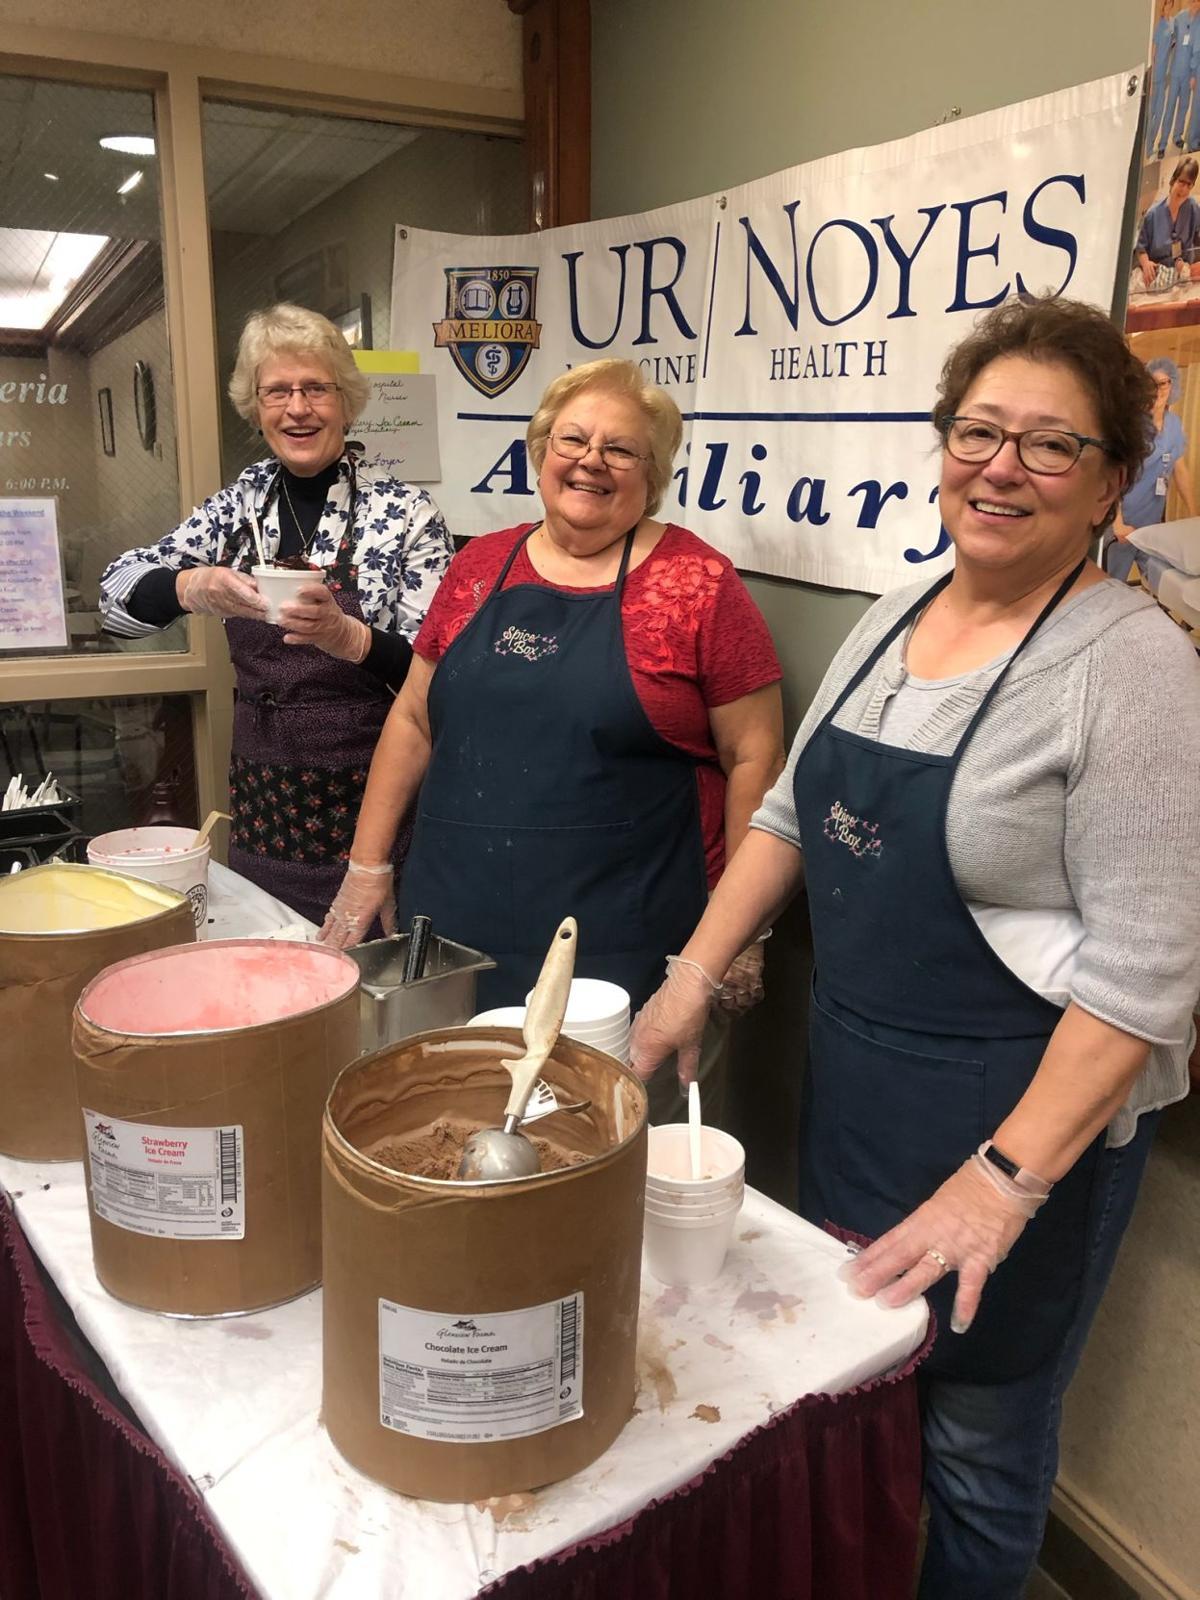 Scooping ice cream for National Hospital Week and National Nurses Week!